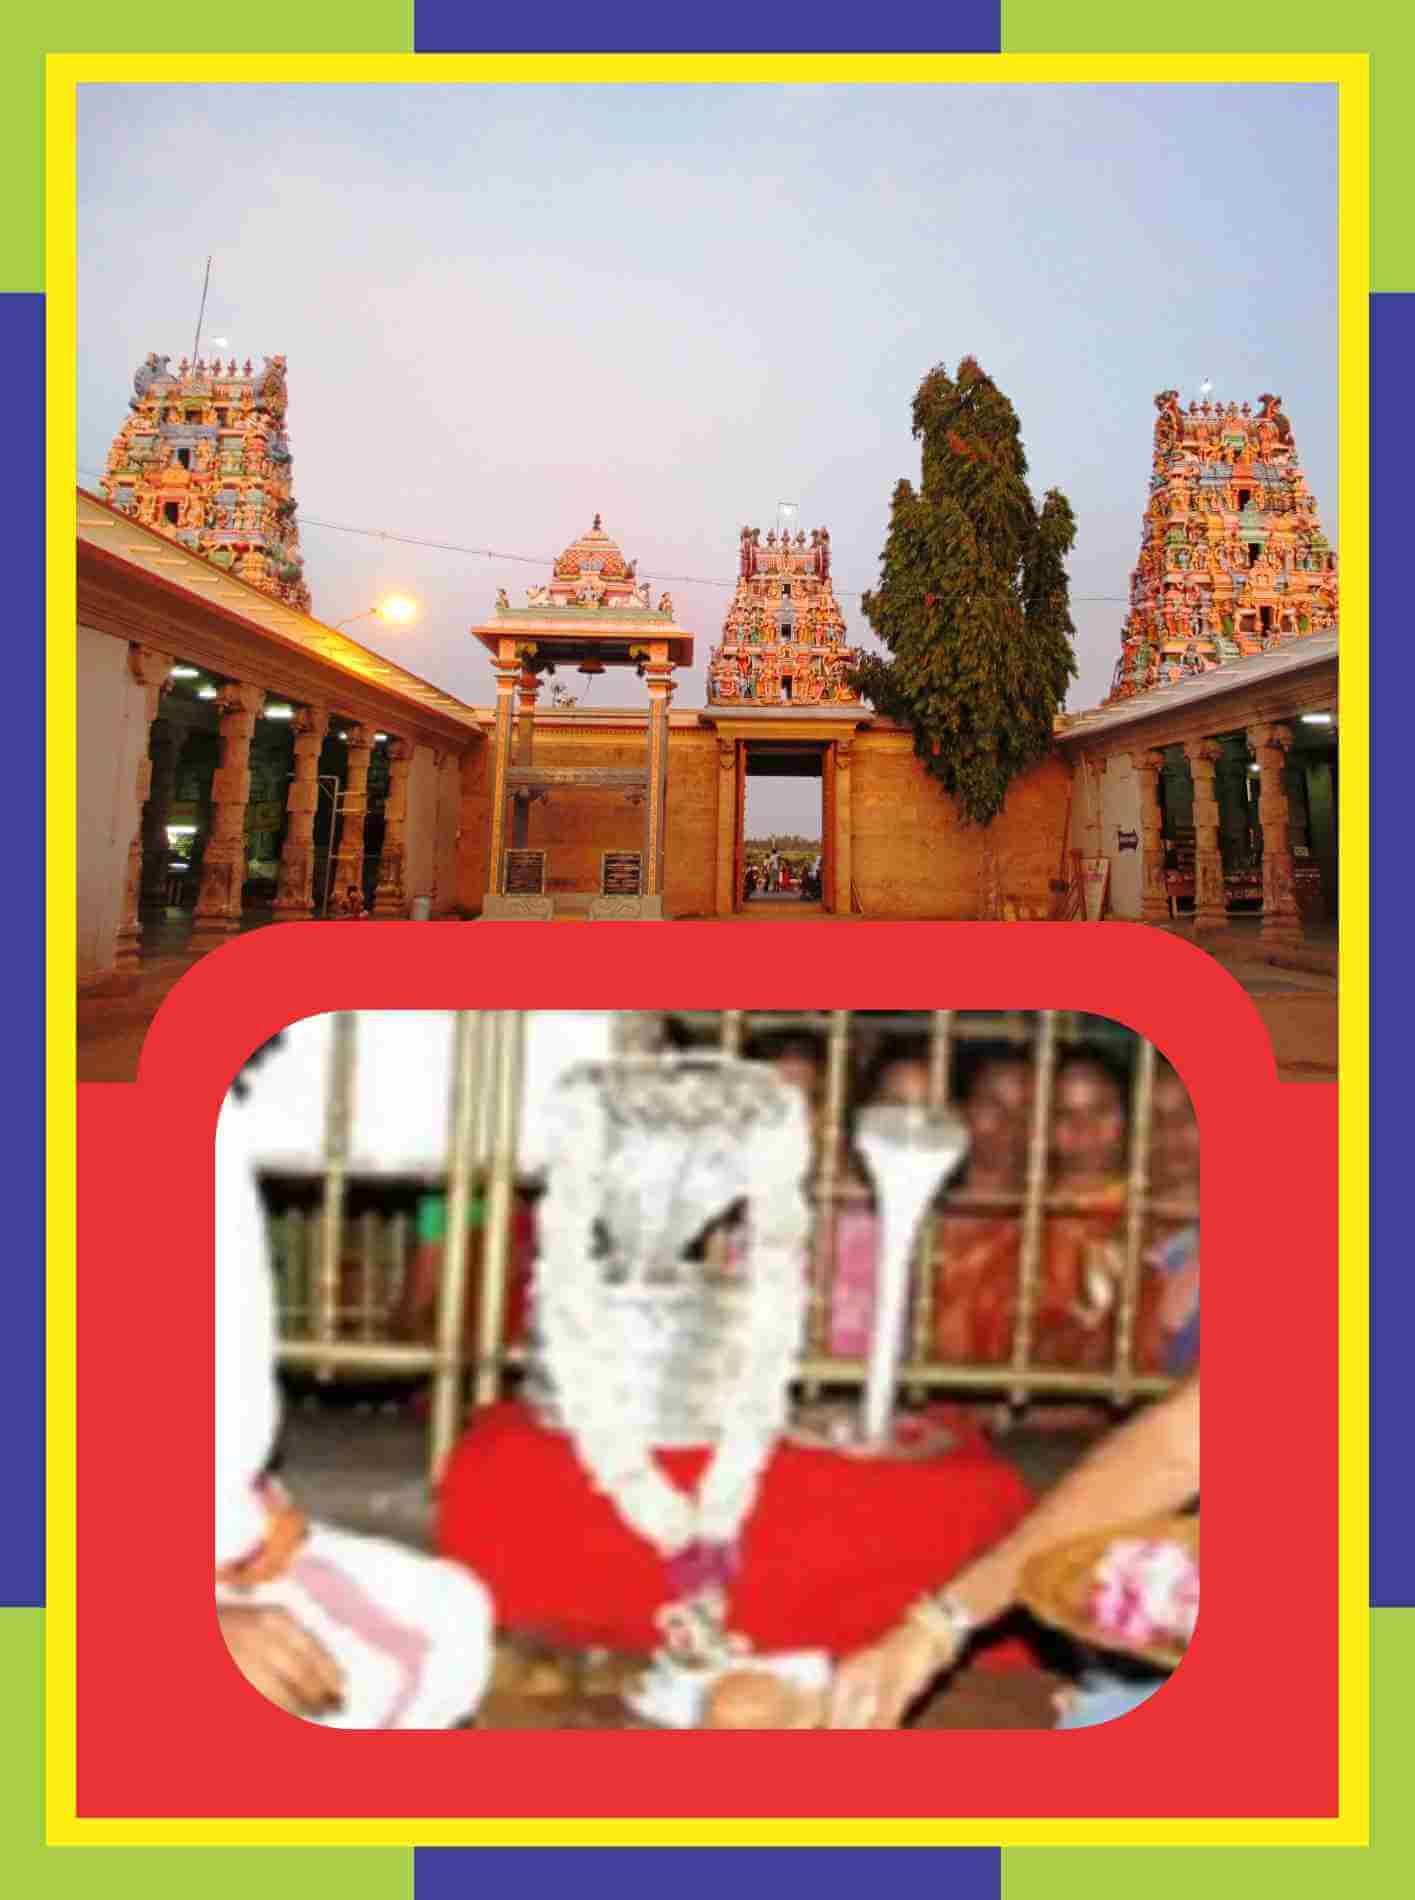 Kodumudi – Magudeswarar Temple Rahu / Kethu Naga Prathista